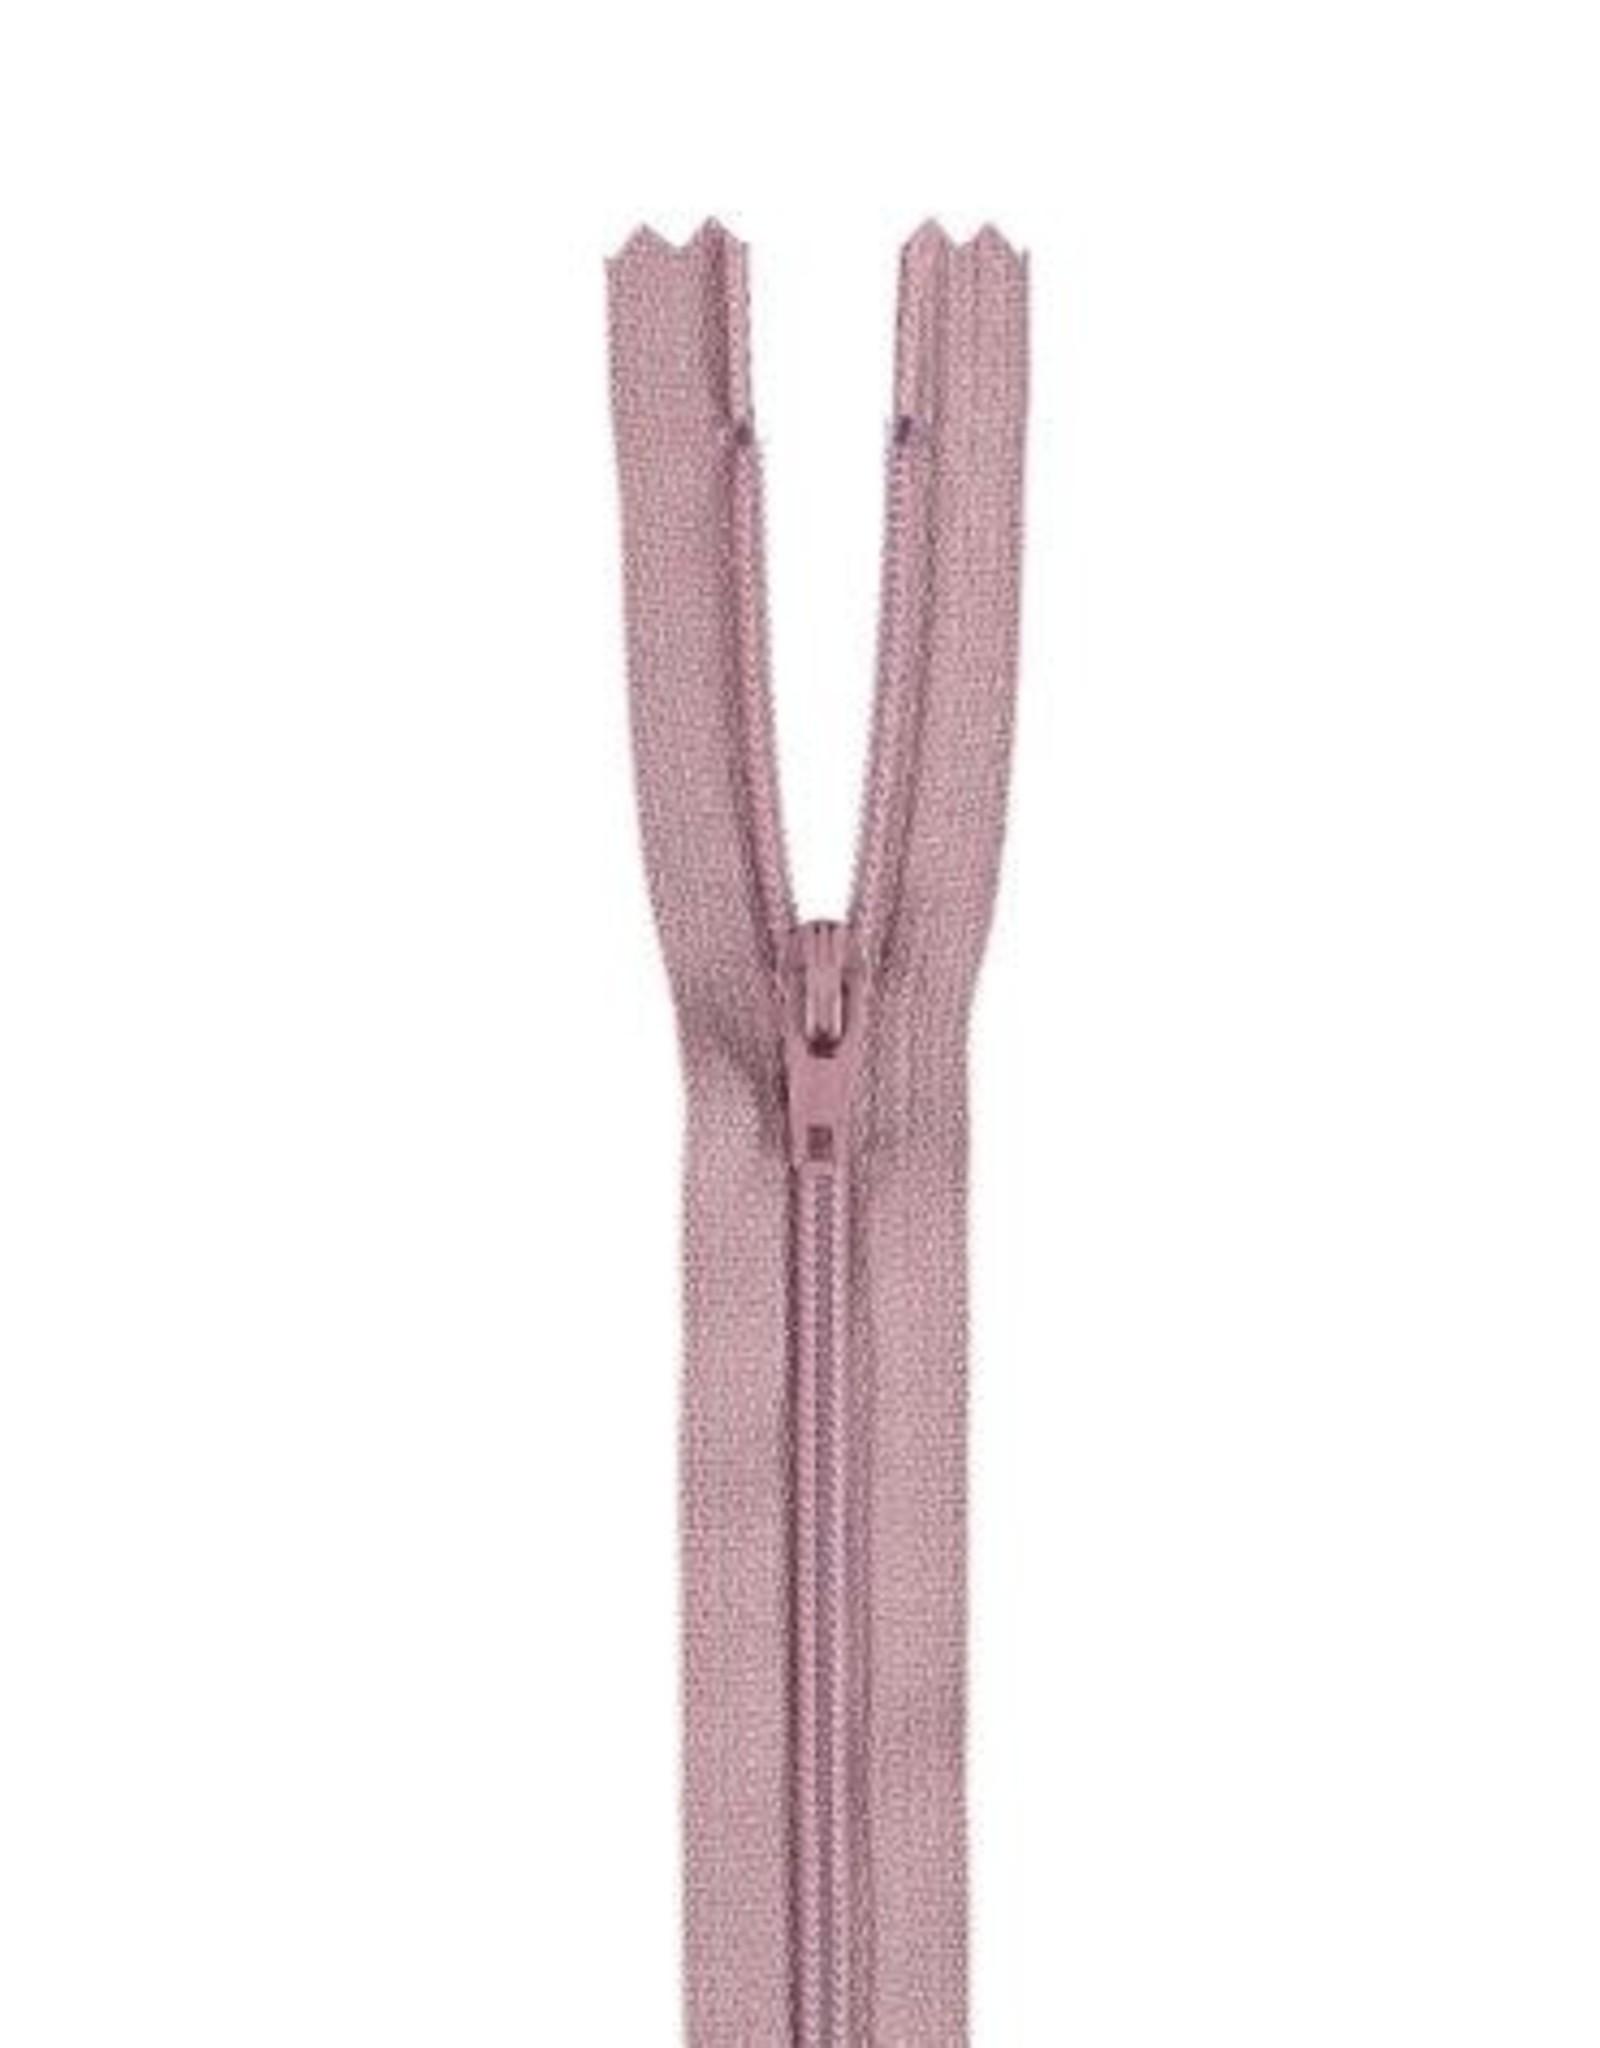 YKK Spiraalrits niet-DB 3mm oud roze 069-40cm